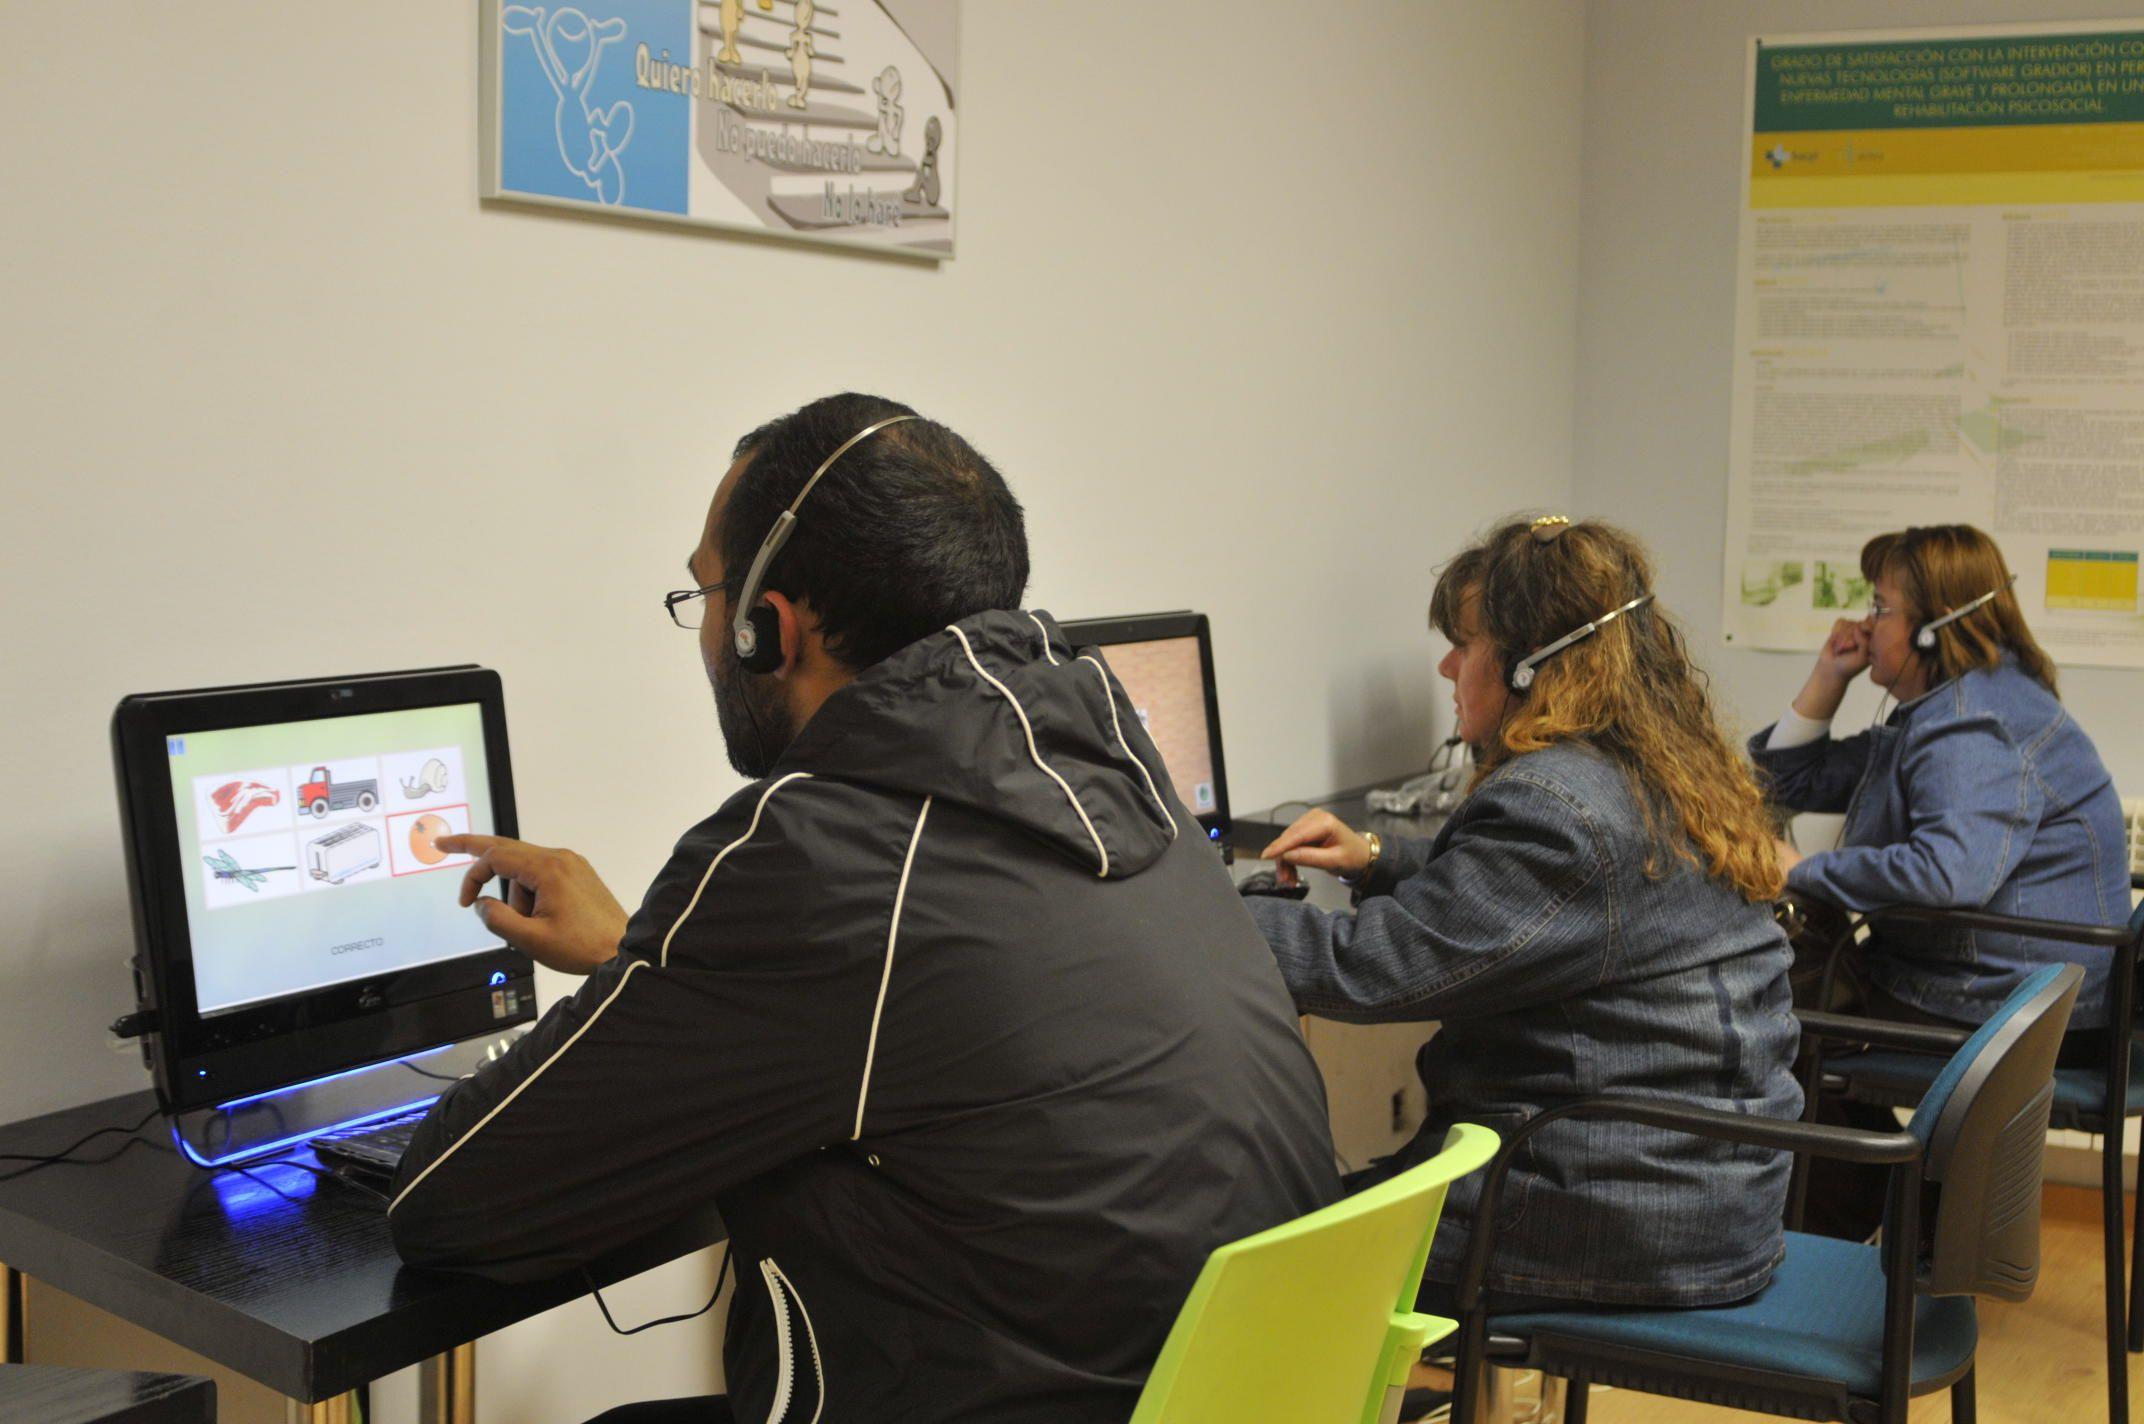 Sesión de rehabilitación cognitiva con el software Gradior en el Centro de Rehabilitación Psicosocial de Zamora